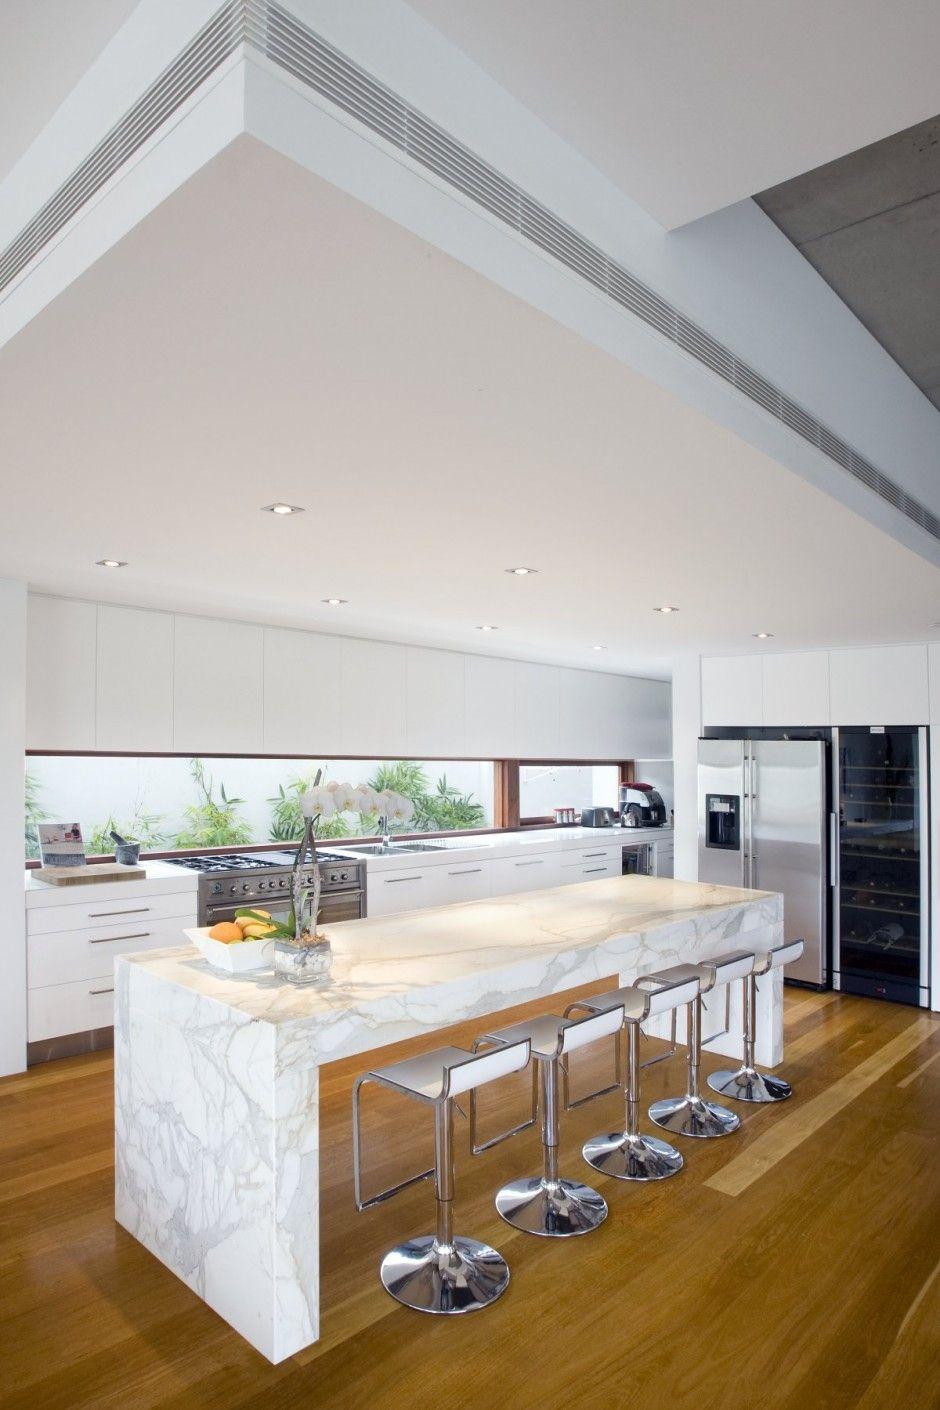 Villa De Luxe A L Australienne Cuisine Design De Cuisine